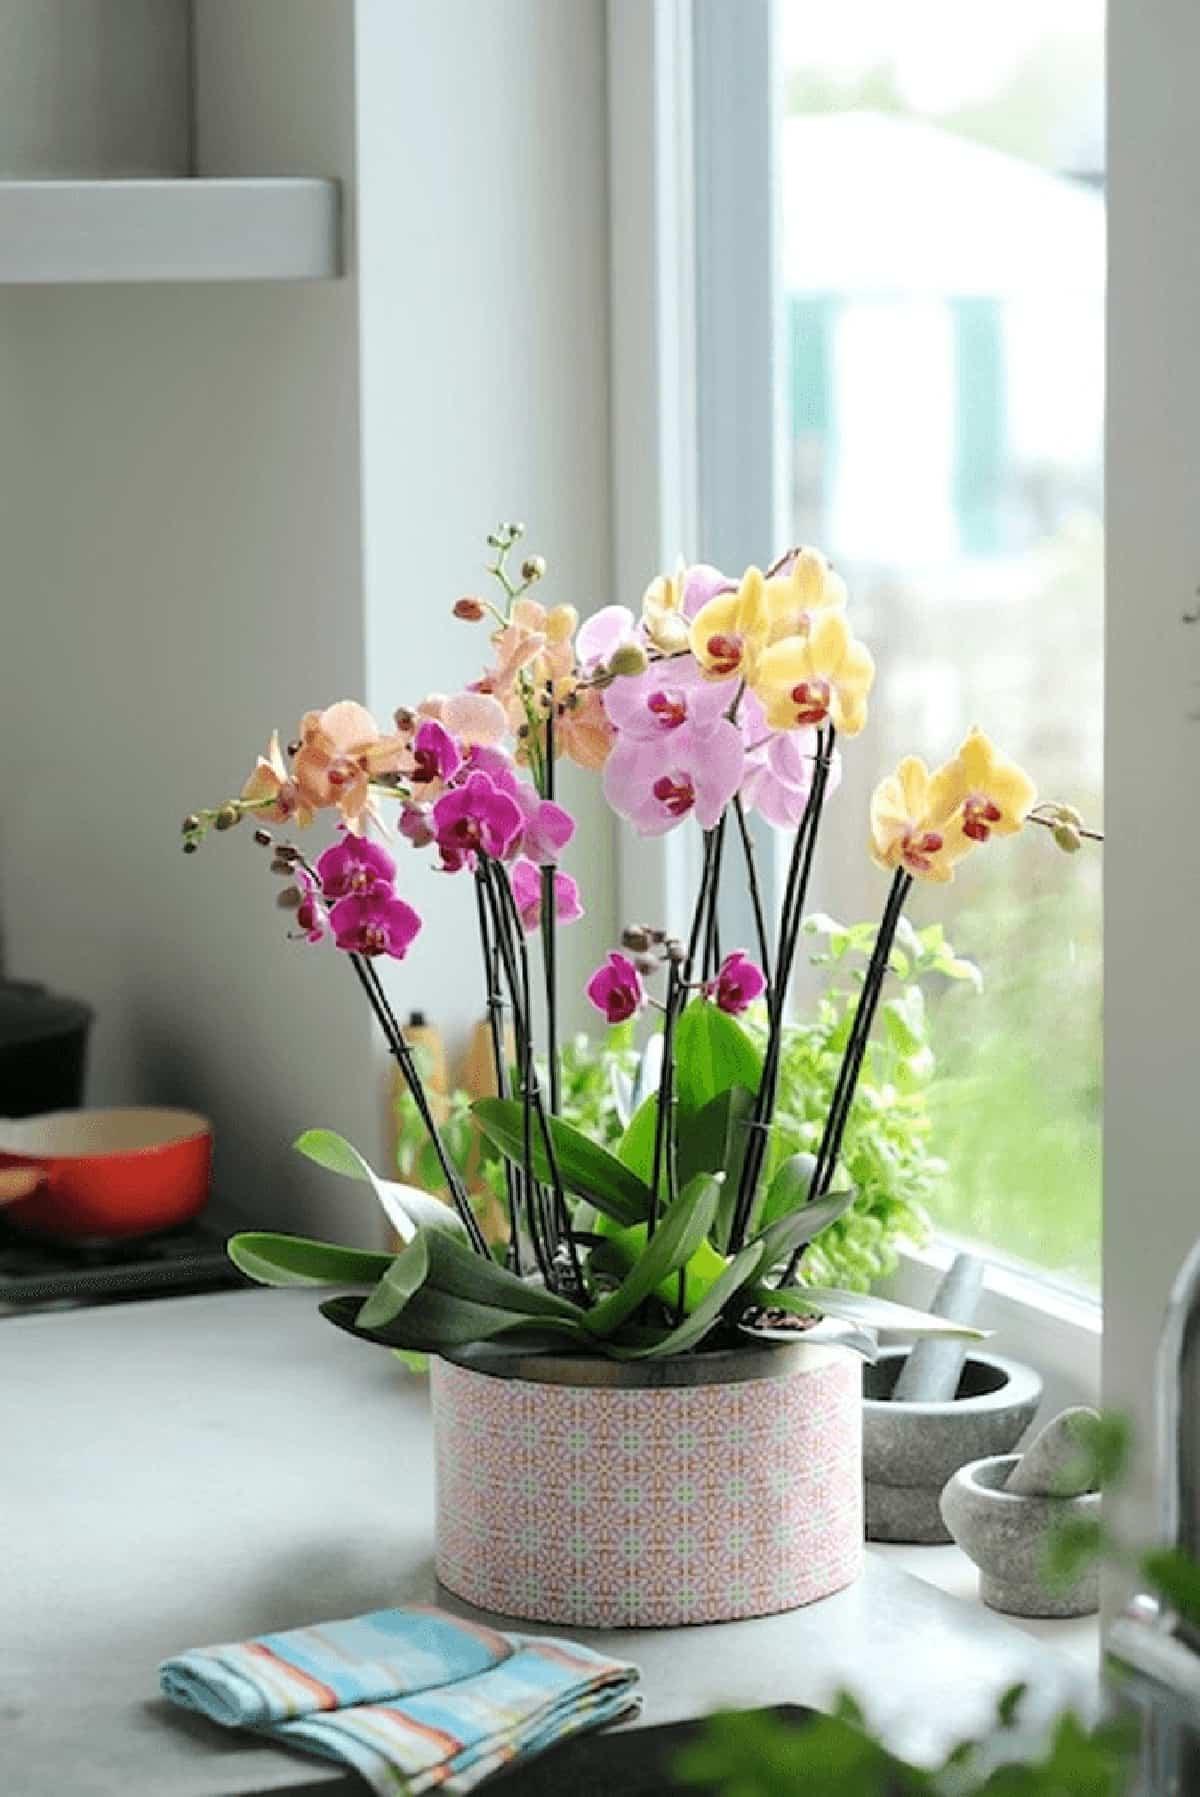 claves para decorar con orquideas tu hogar 4